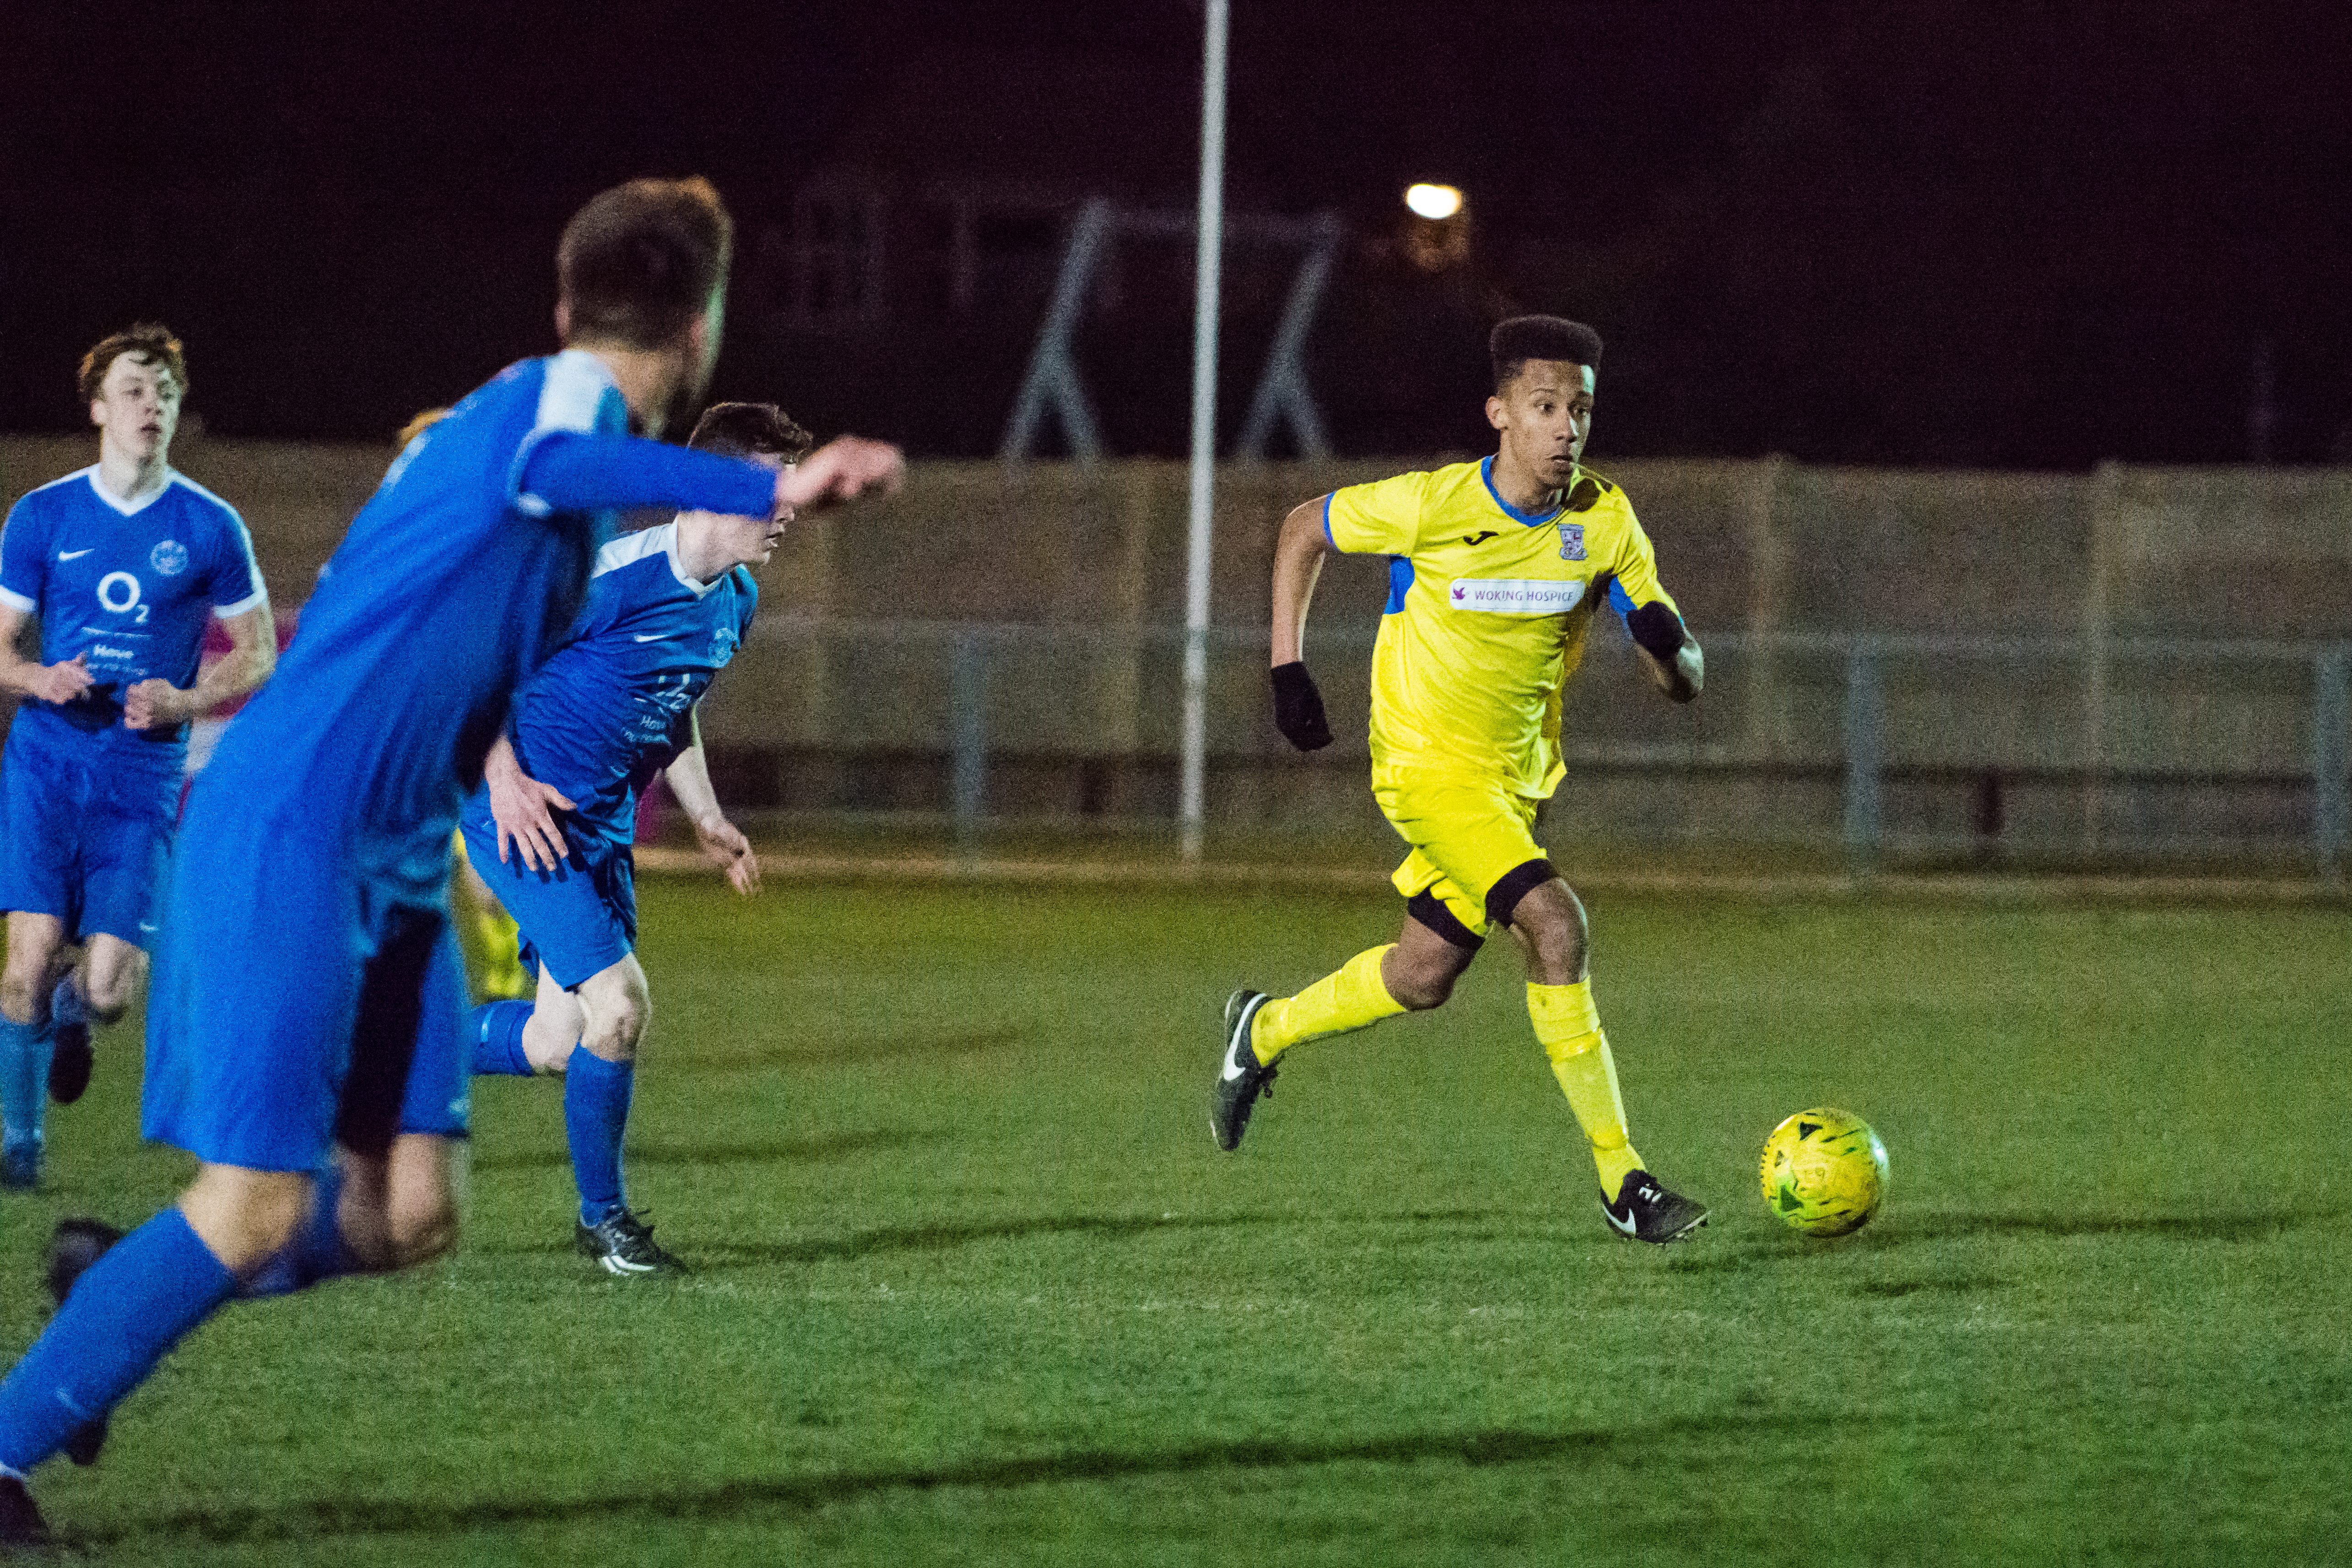 DAVID_JEFFERY Shoreham FC U18s vs Woking FC Academy 22.03.18 57